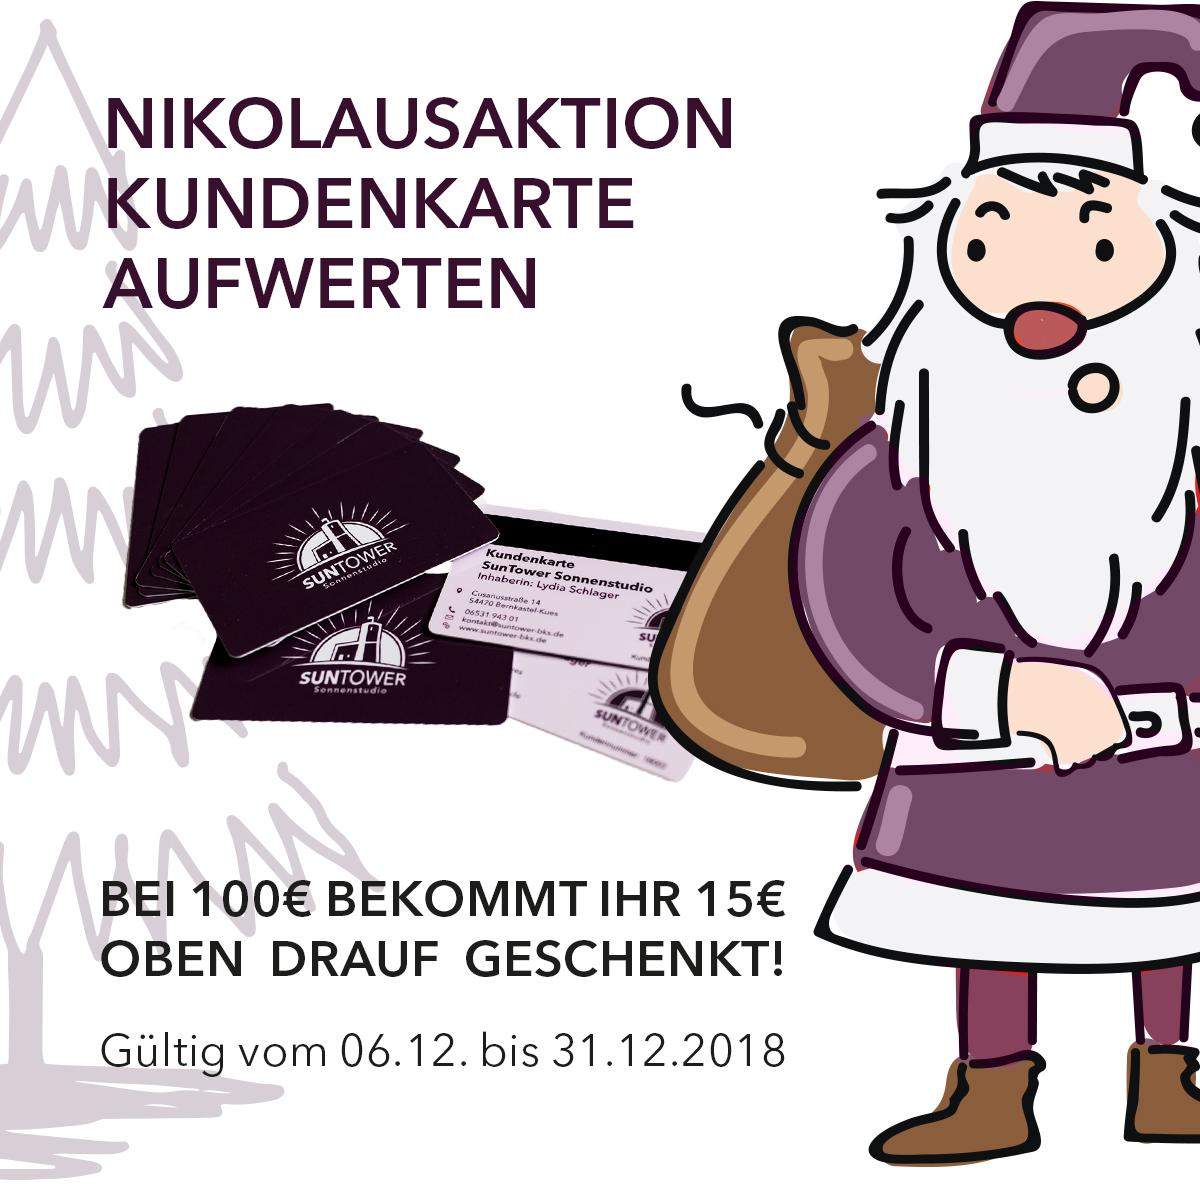 Nikolaus-Aktion SunTower Sonnenstudio Bernkastel-Kues